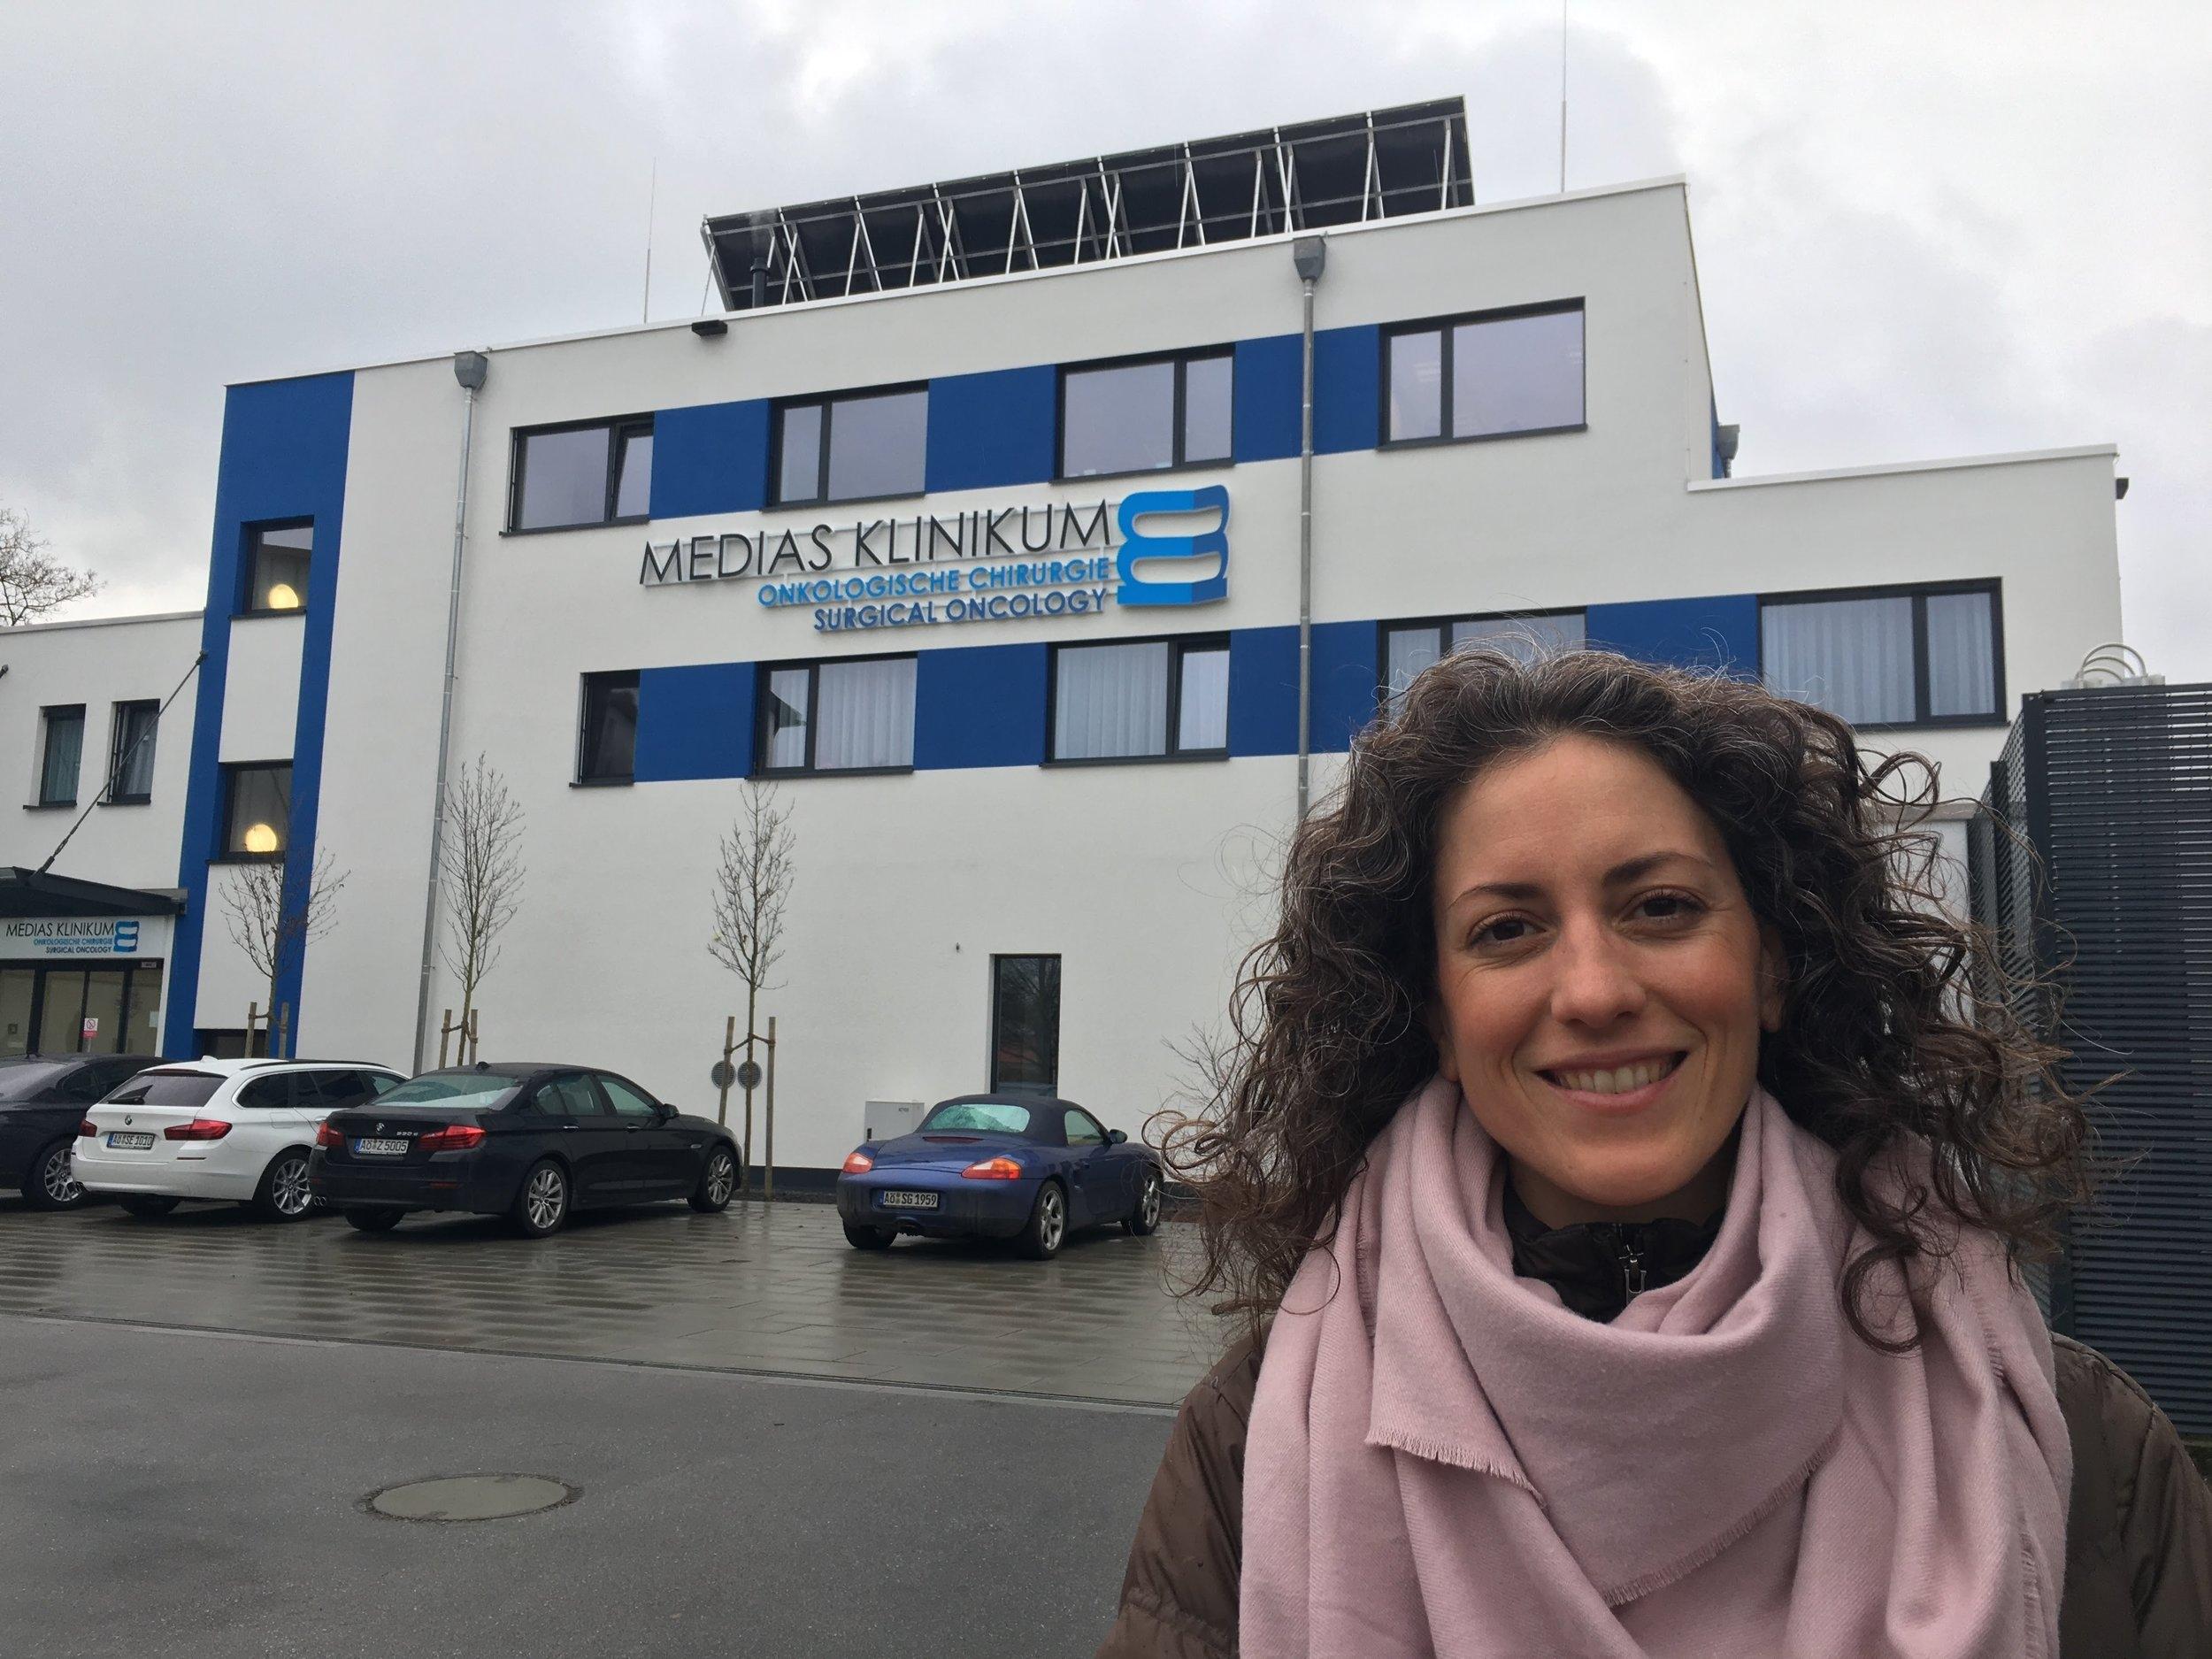 Visiting German Cancer Clinics Medias Klinikum